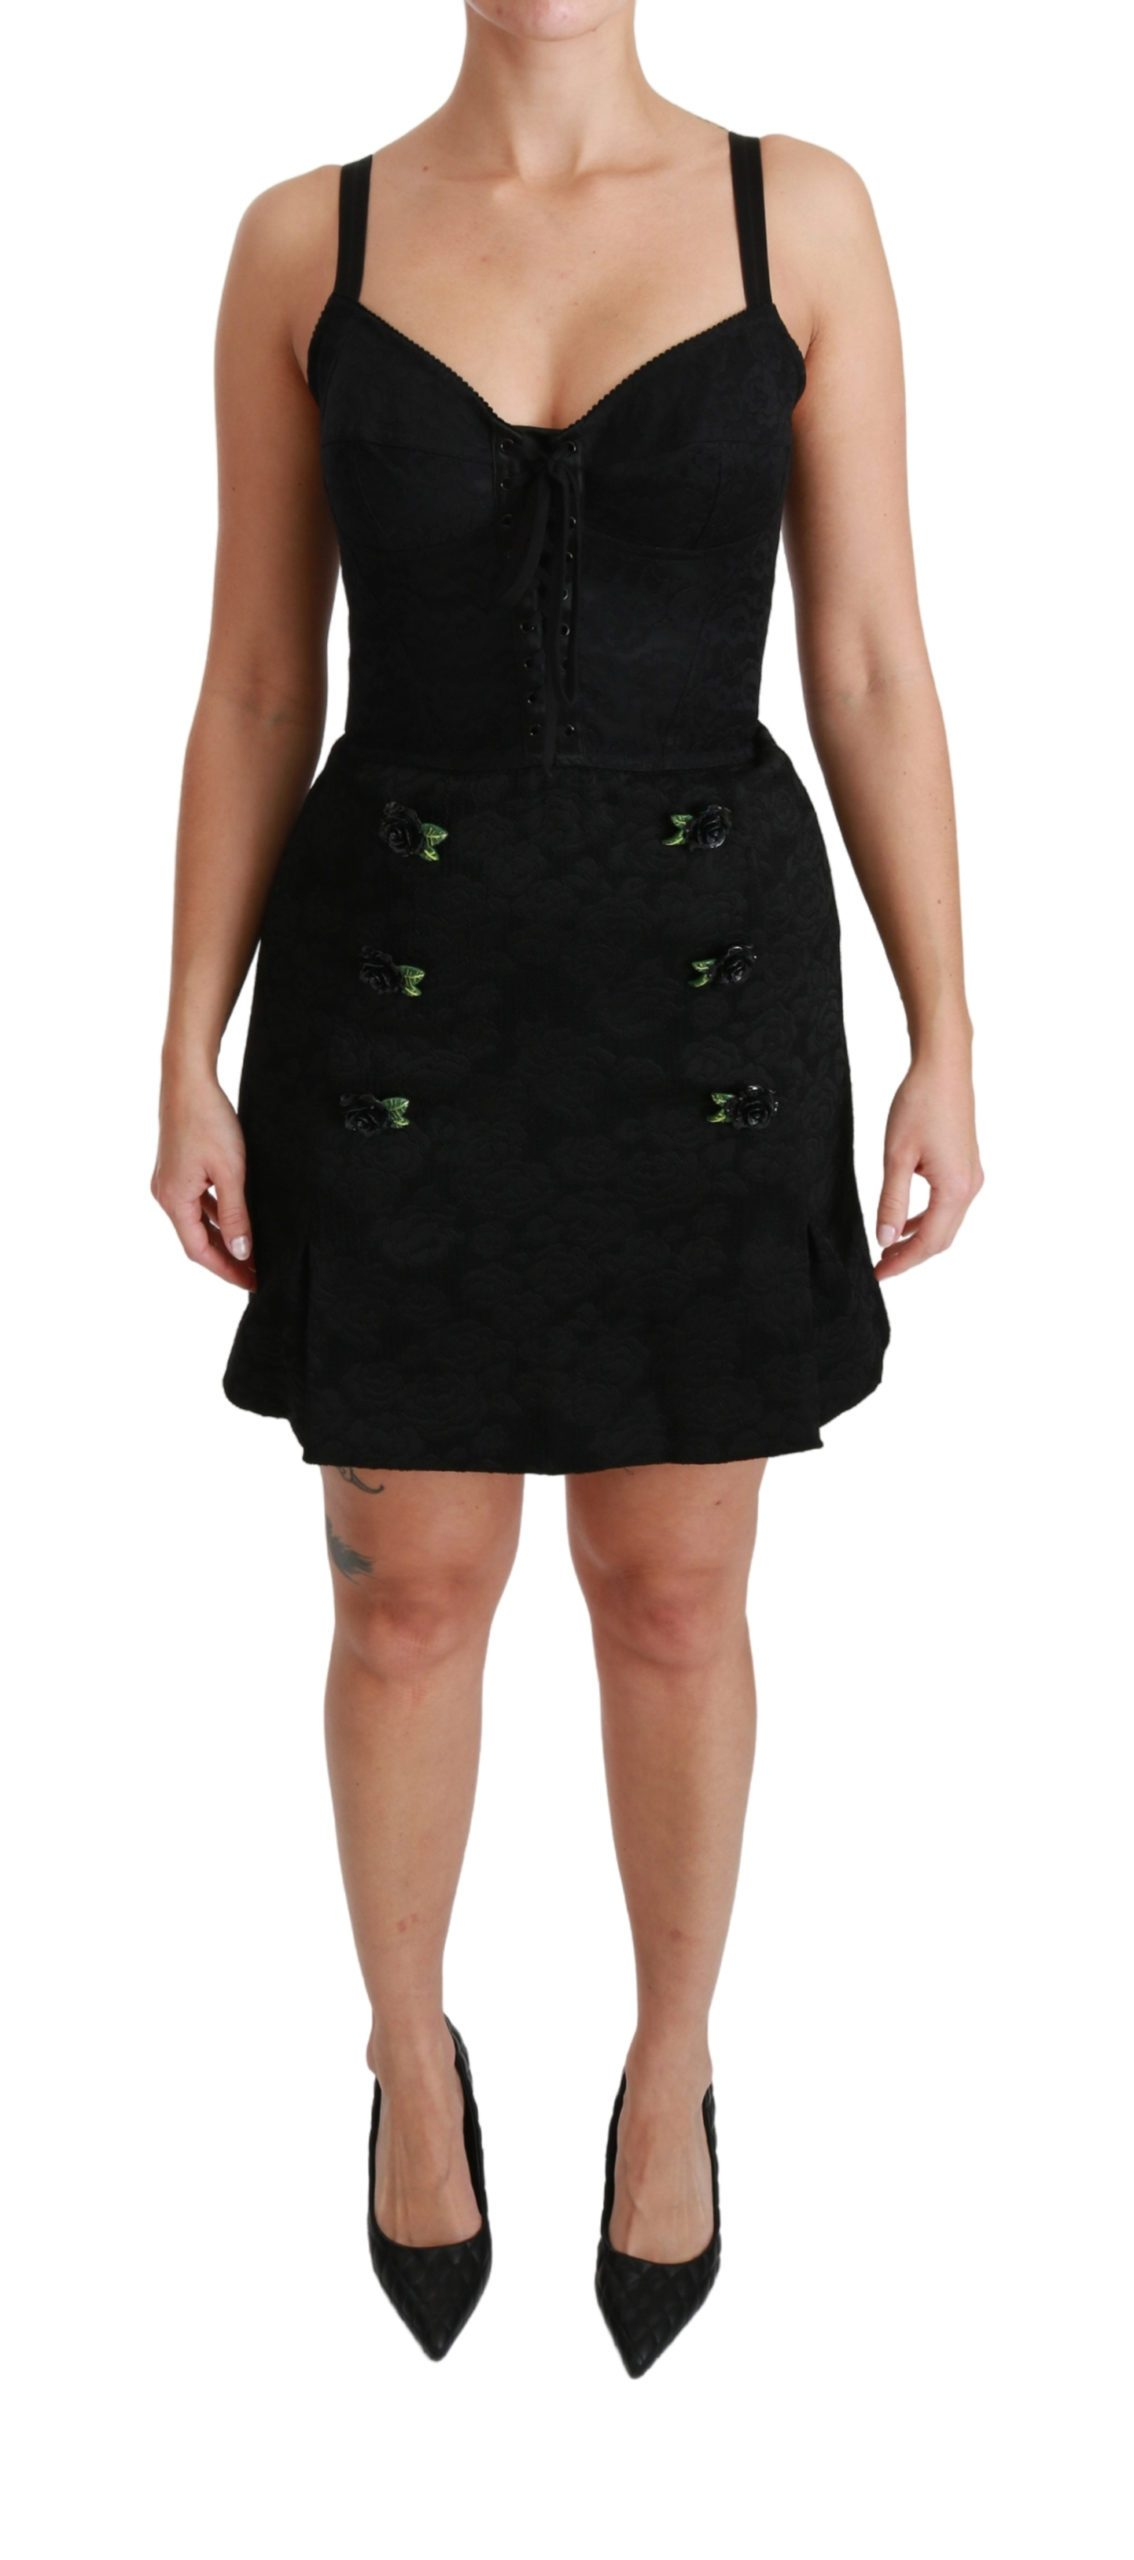 Dolce & Gabbana Women's Jacquard Corset Bustier Roses Dress Black DR2488 - IT40|S